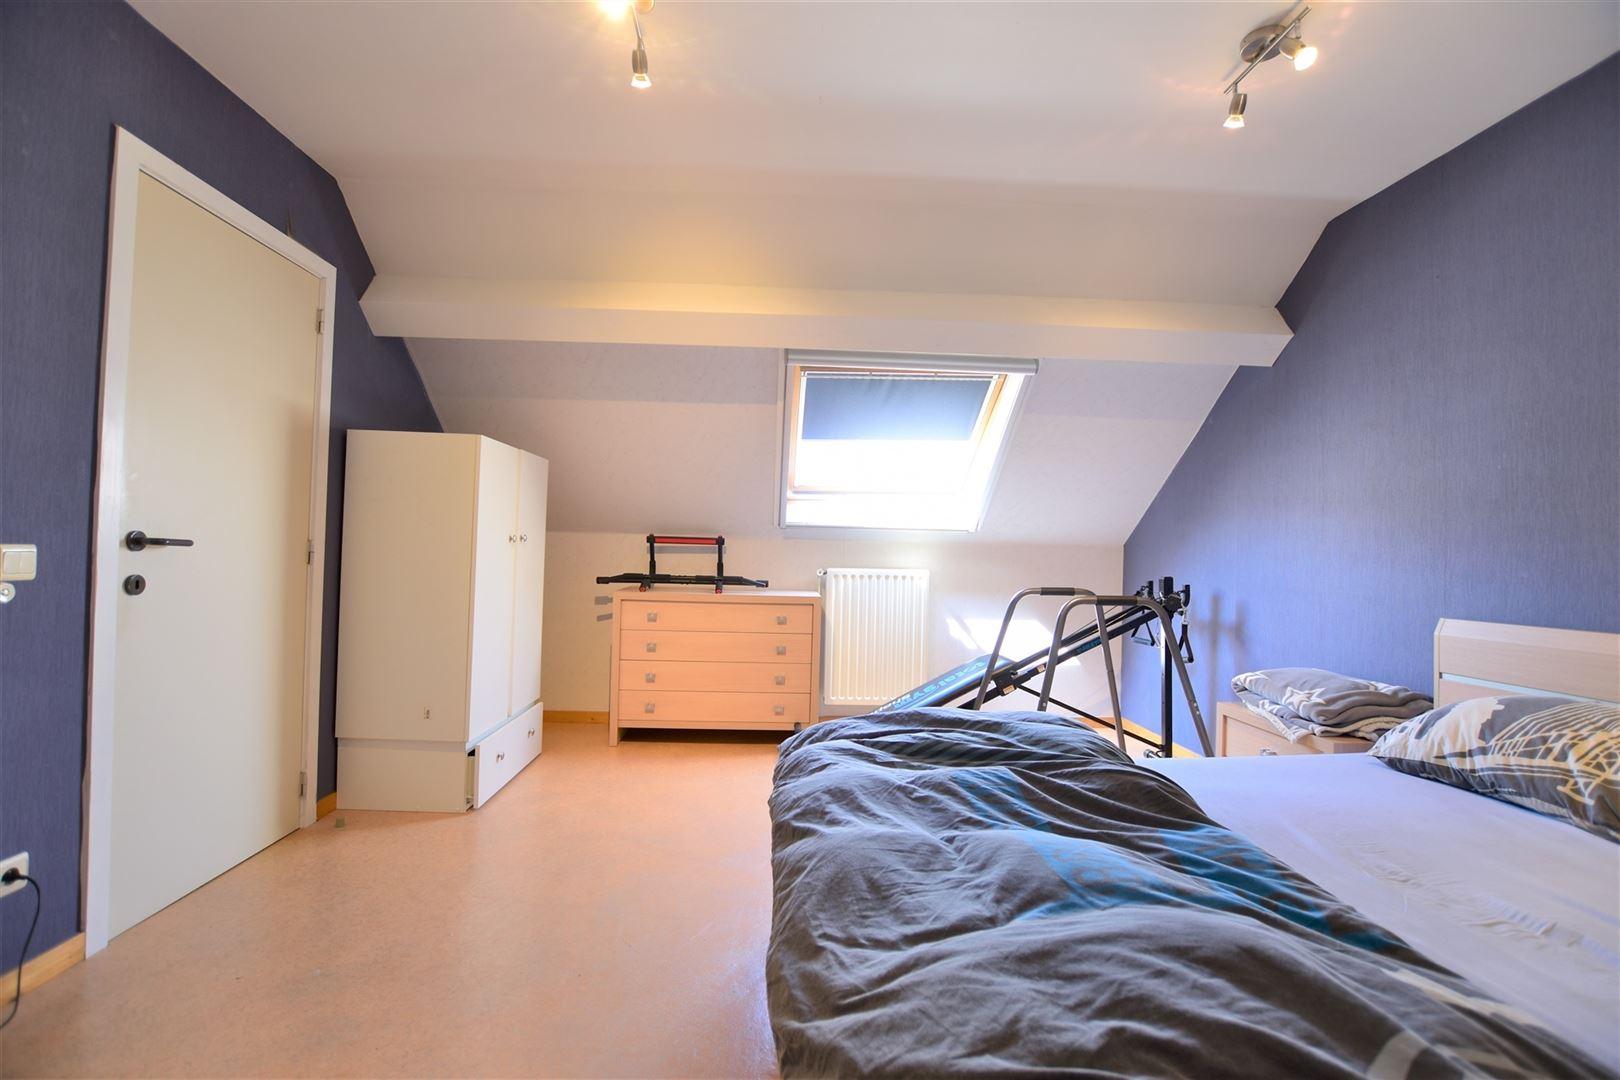 Foto 12 : Duplex/triplex te 9200 BAASRODE (België) - Prijs € 159.000